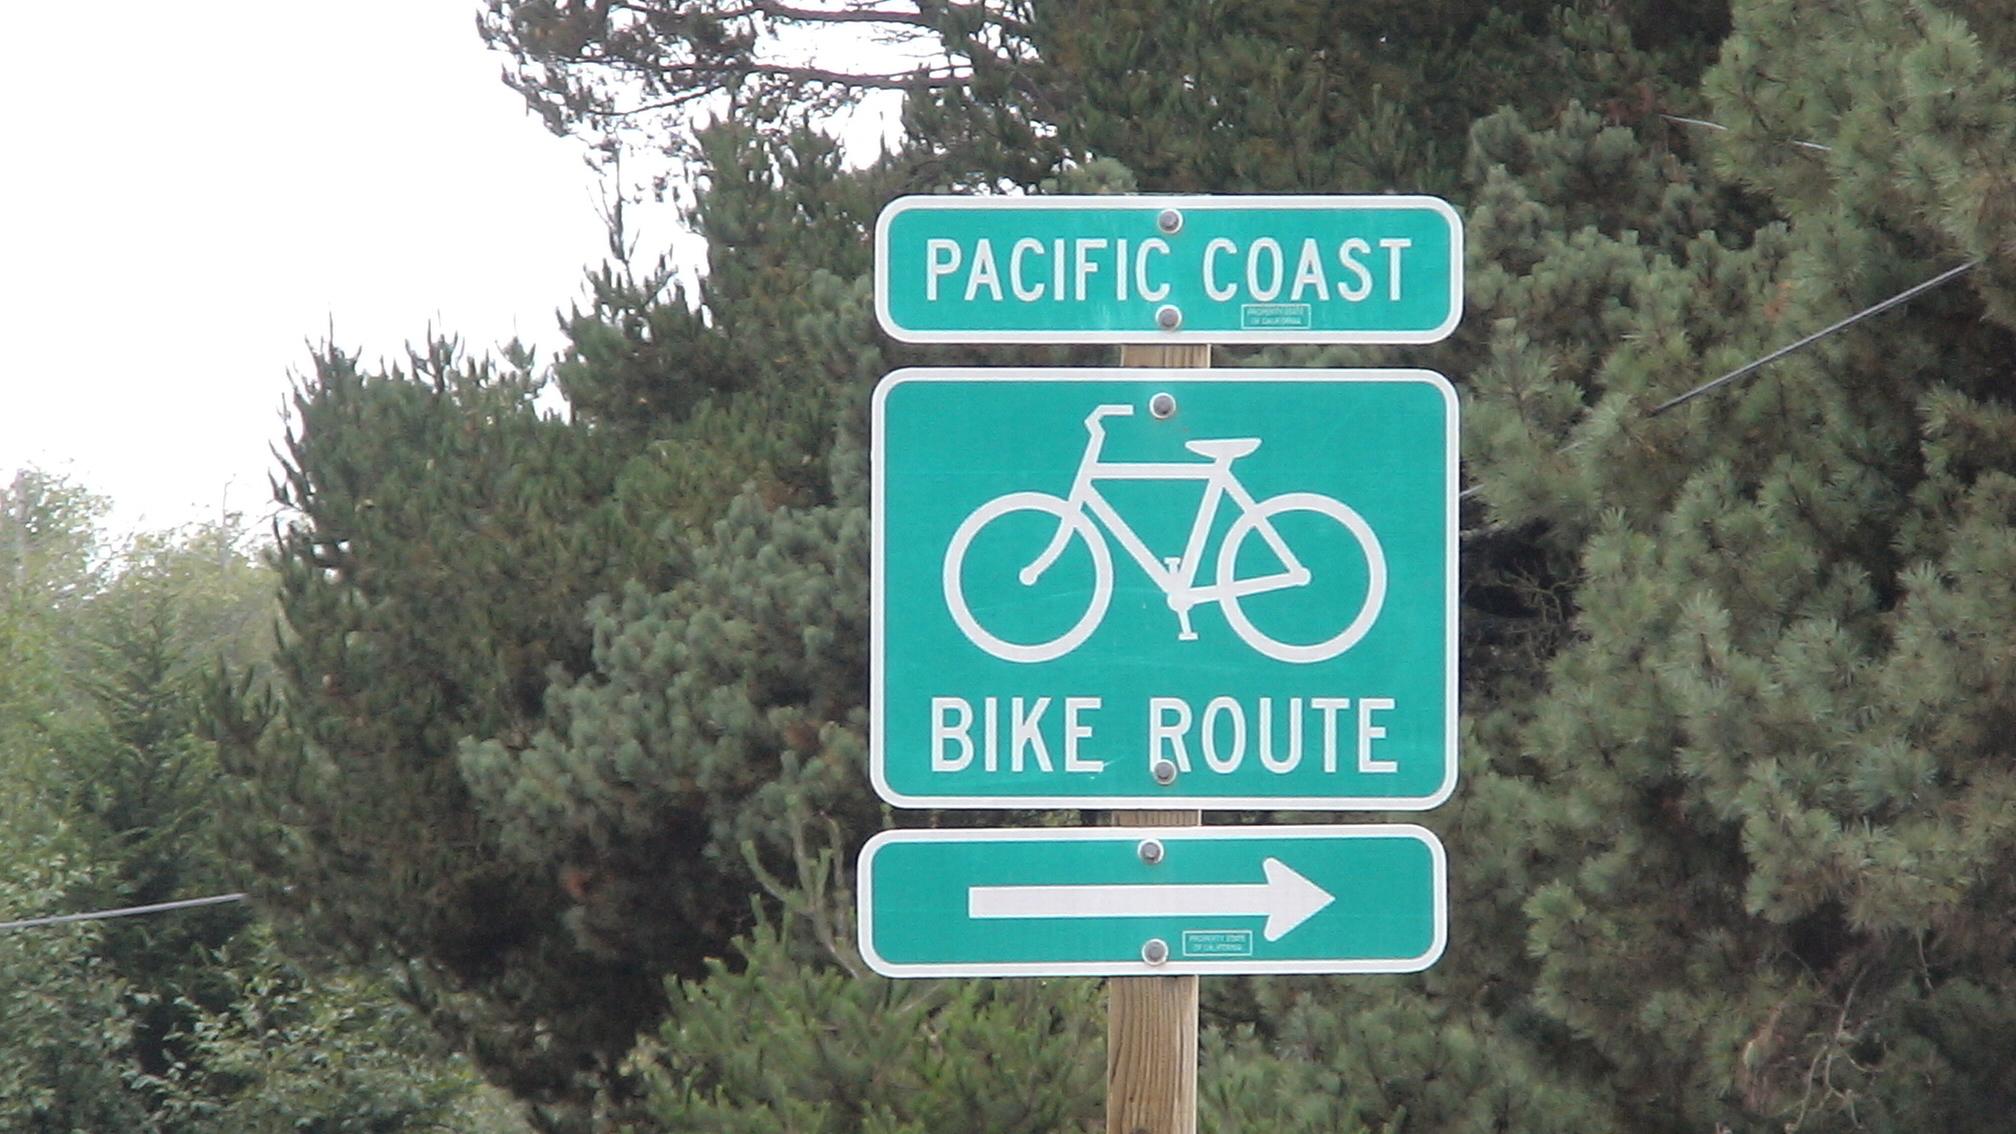 Biking The Pacific Coast - Pacific Coast Bike Route Map California